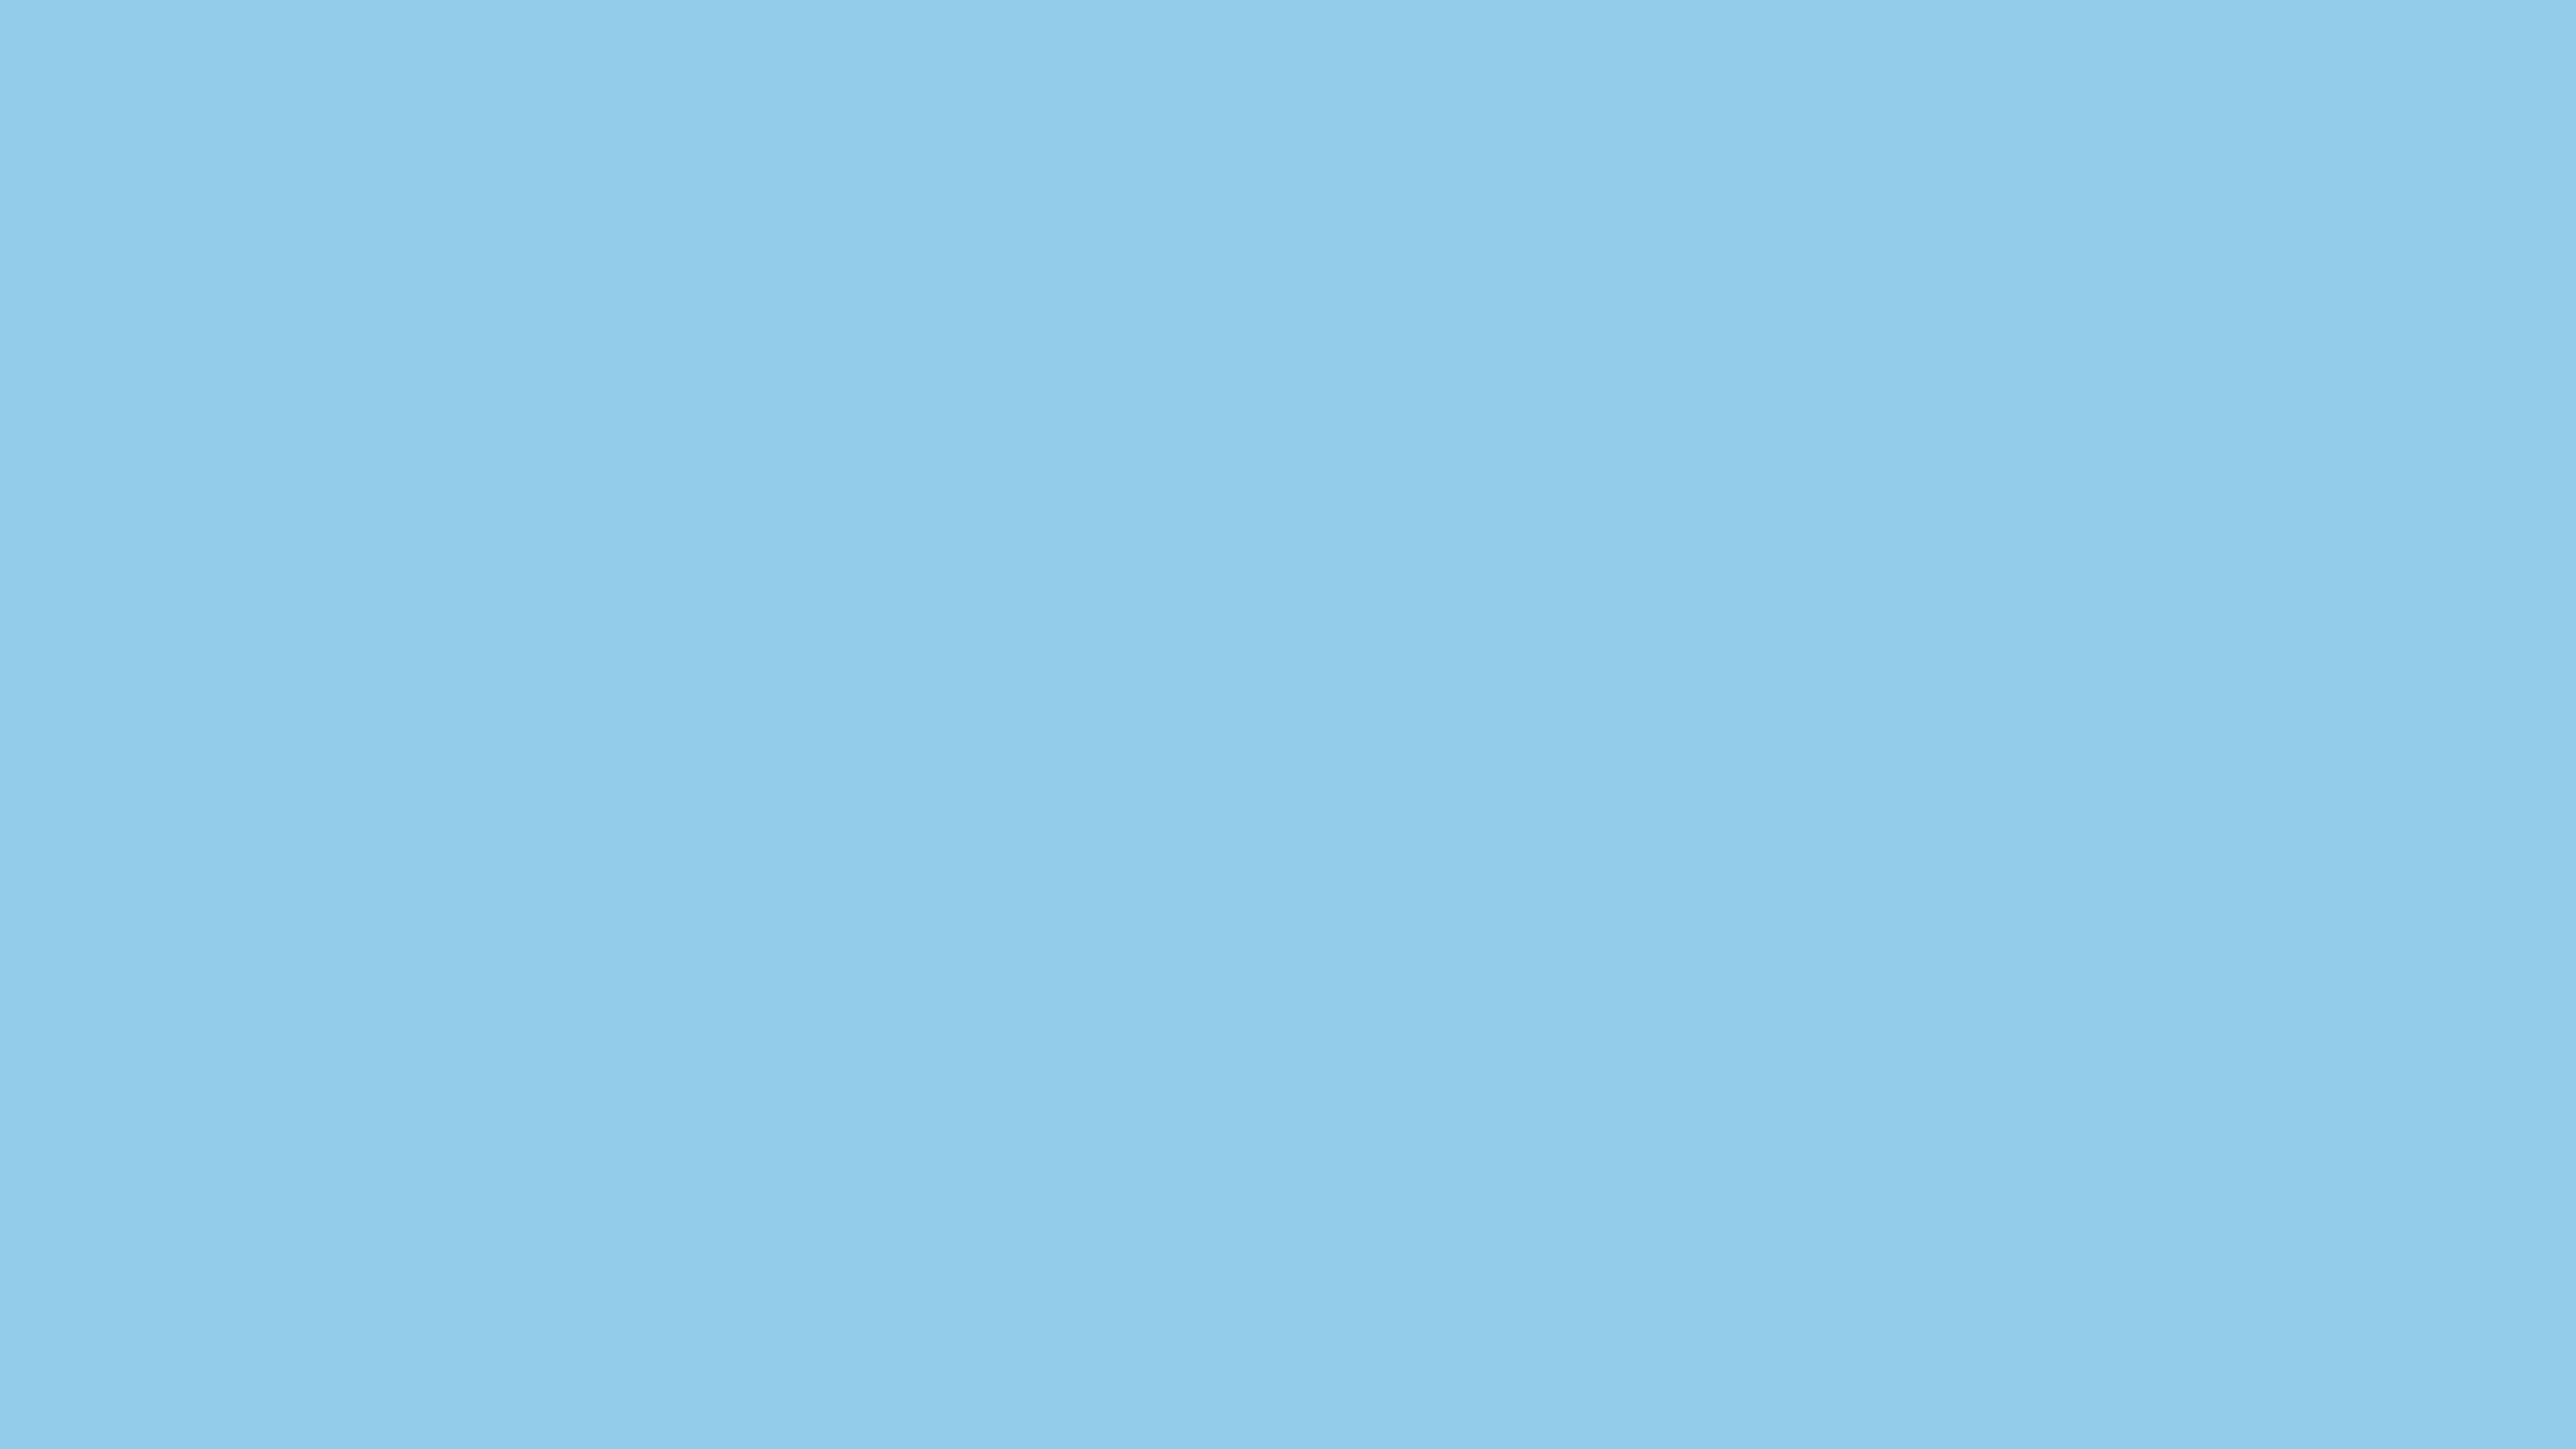 4096x2304 Light Cornflower Blue Solid Color Background